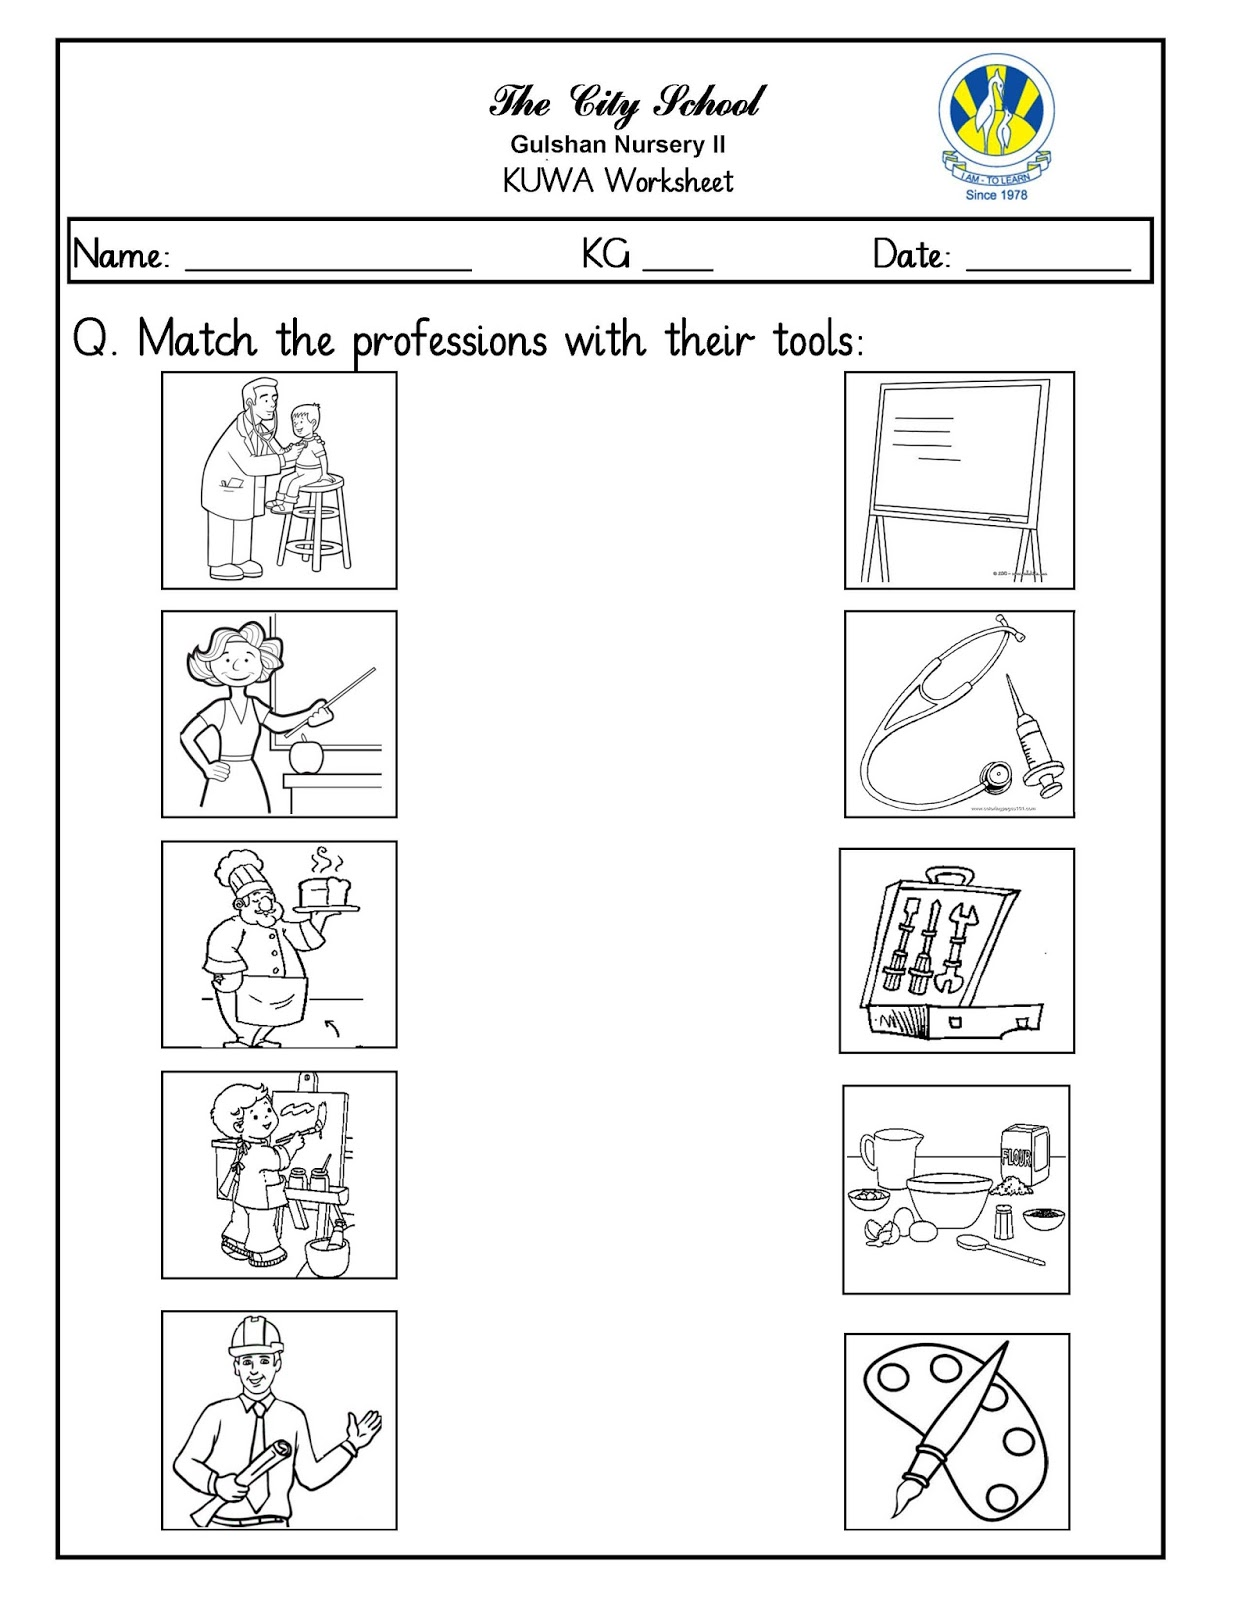 Sr Gulshan The City Nursery Ii English And Kuwa Worksheets